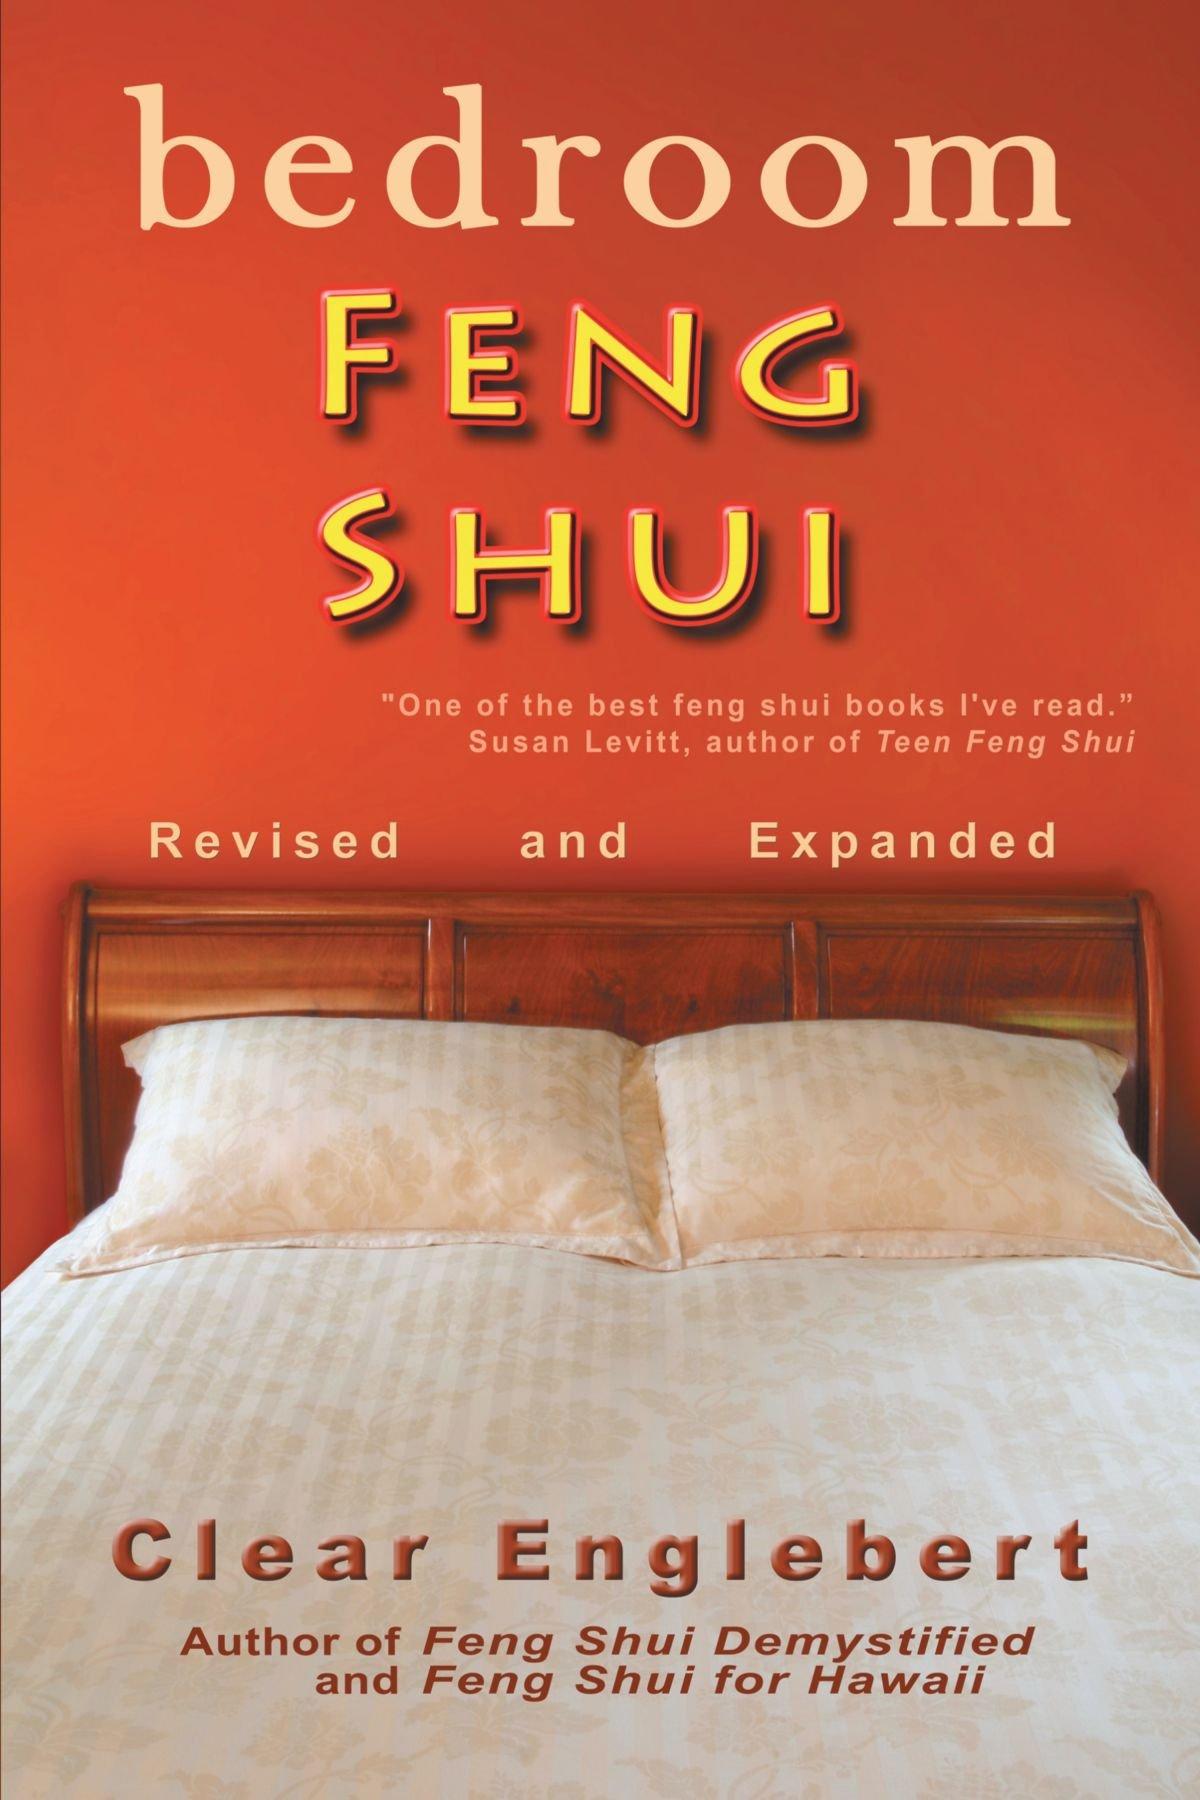 Marvelous Amazon Com Bedroom Feng Shui Revised Edition Interior Design Ideas Gentotthenellocom